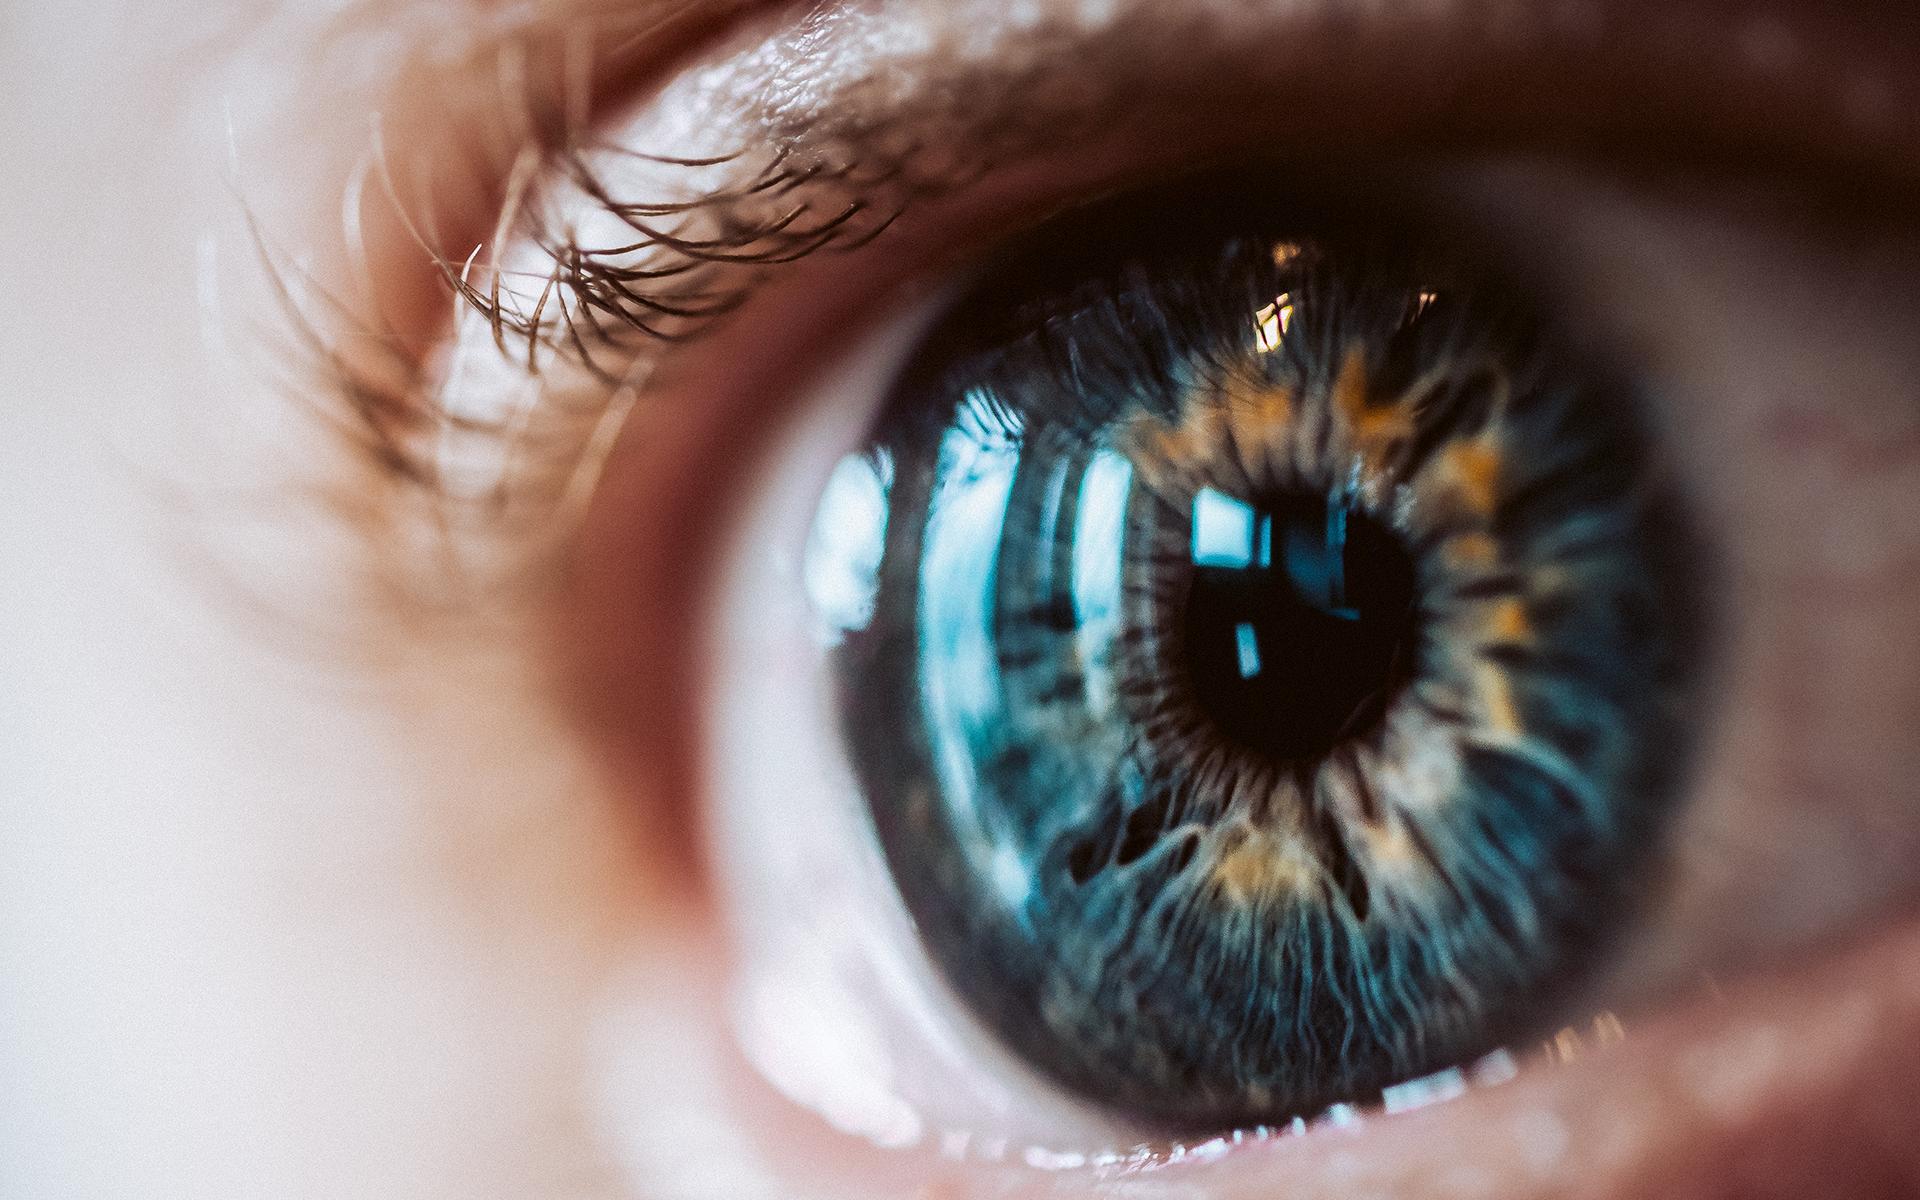 8 Benefits of the Hylo Eye Care® Lubricating Eye Drops